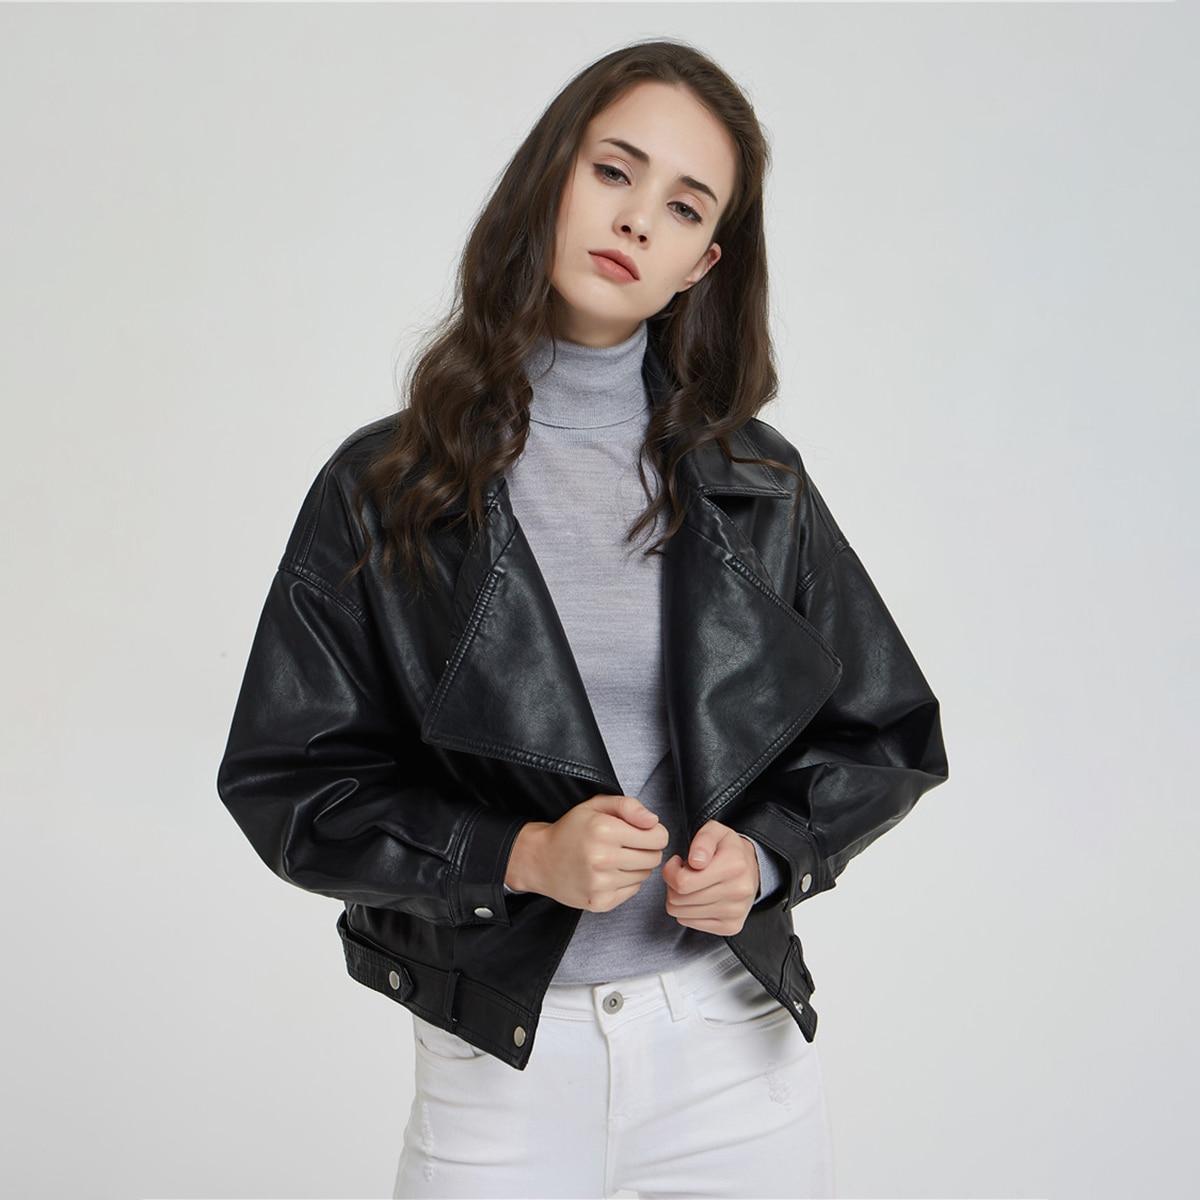 Black Single Breasted Short   Leather   Coat Puff Sleeve Belted Pocket Rivet Faux Jacket 2019 Autumn Women Loose Vintage Outwares